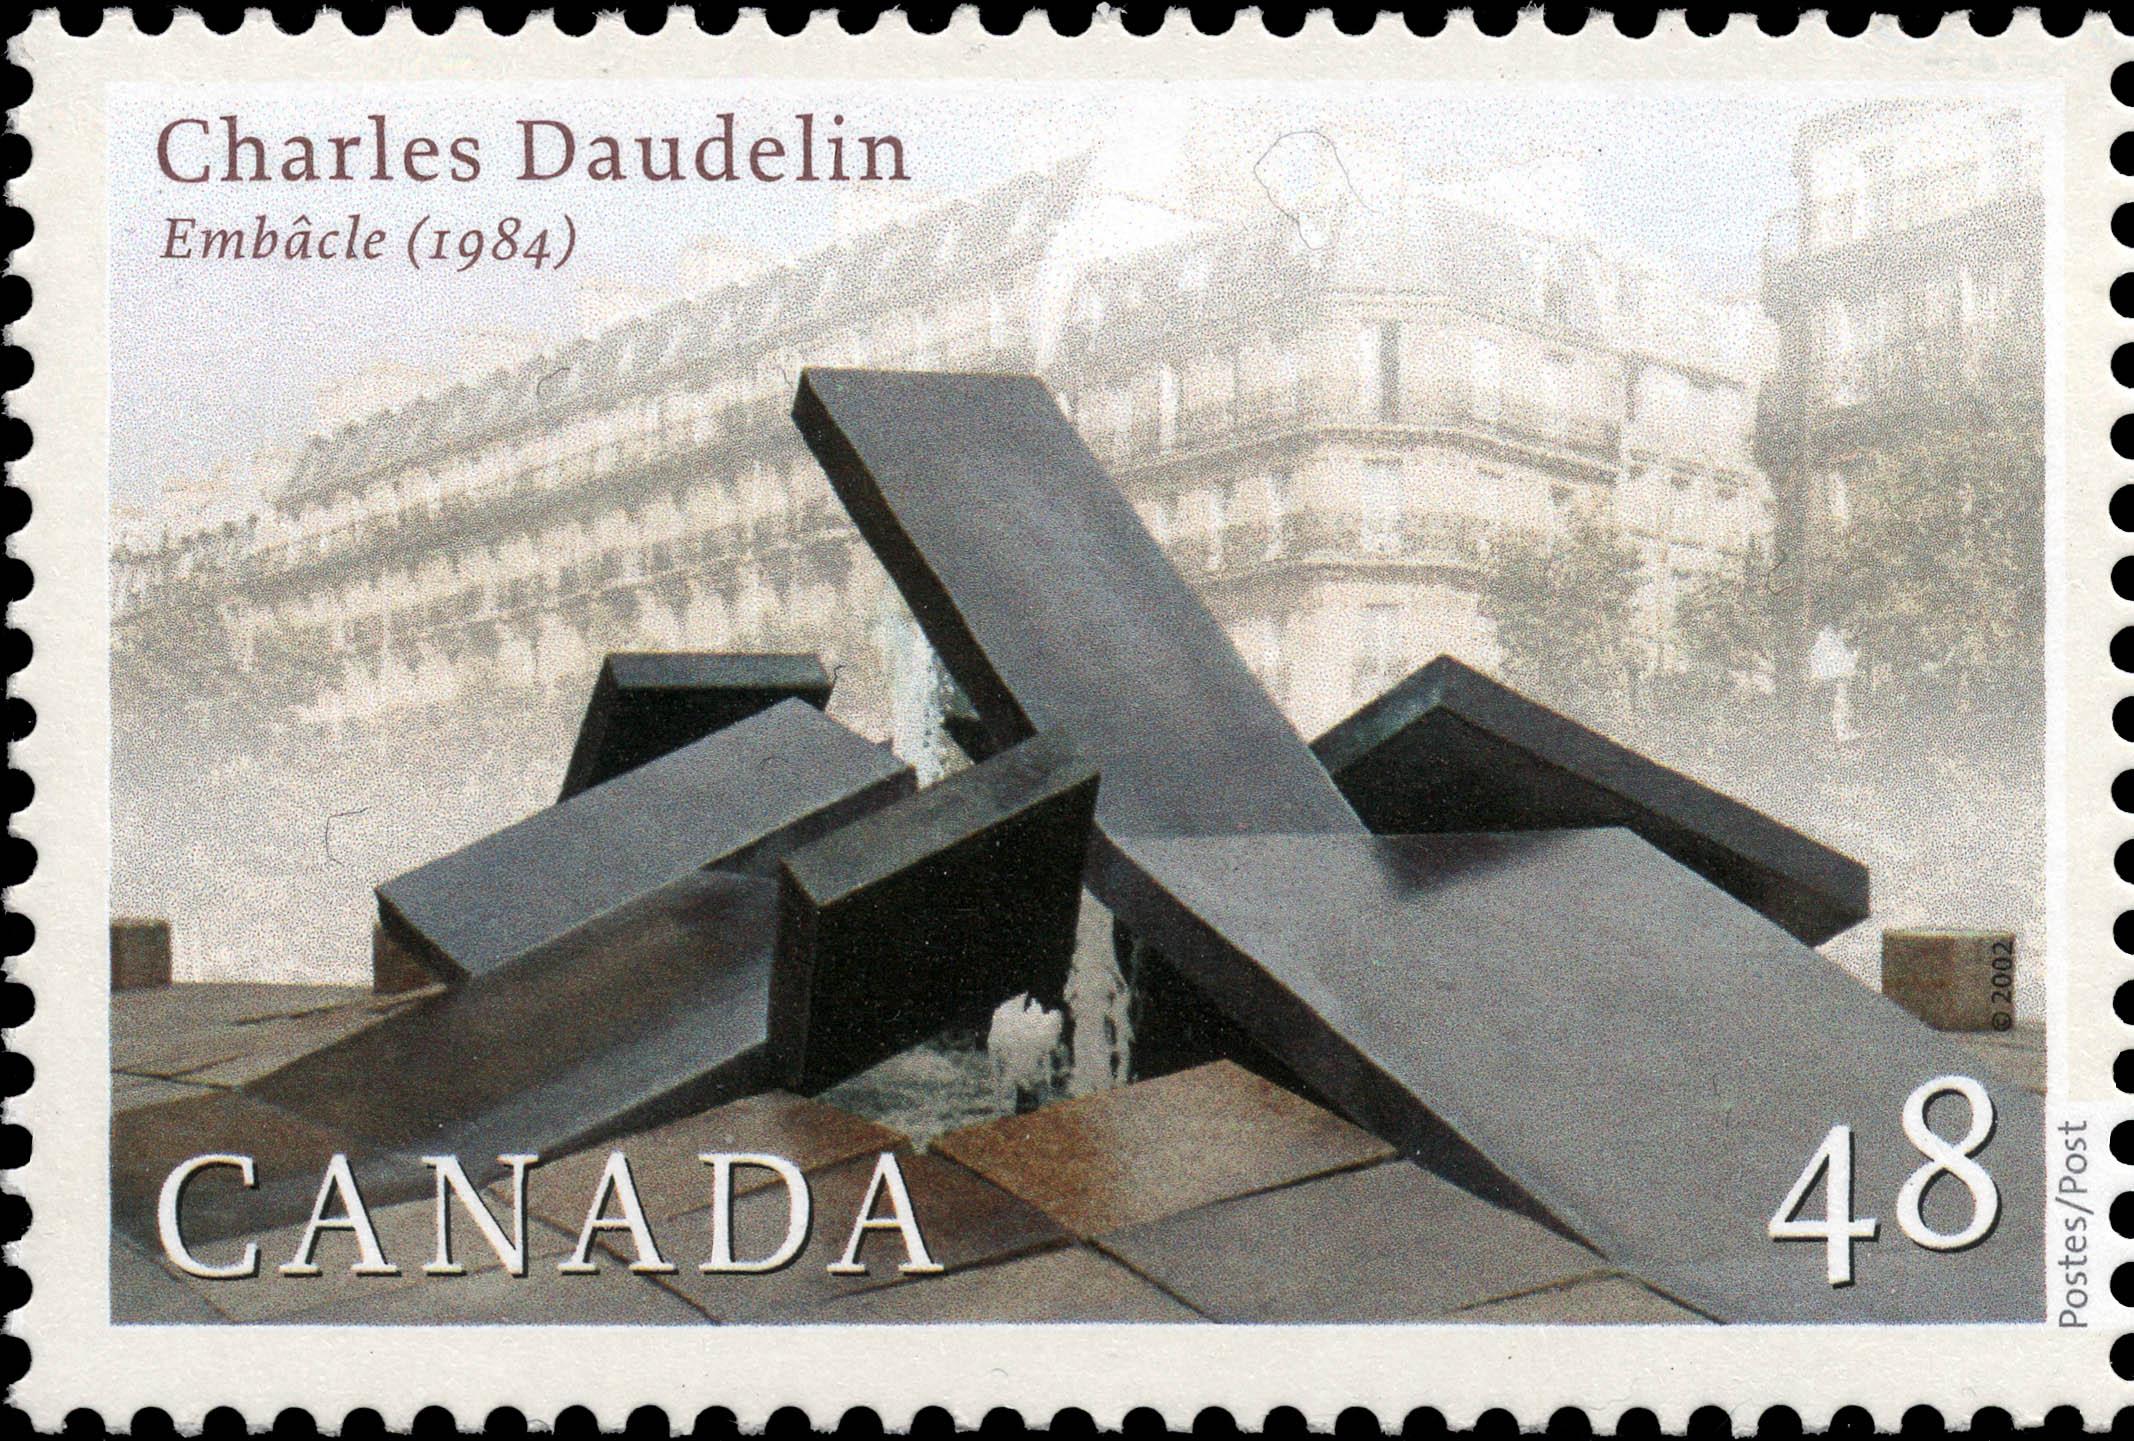 Charles Daudelin, Embacle, 1984 Canada Postage Stamp | Sculptors